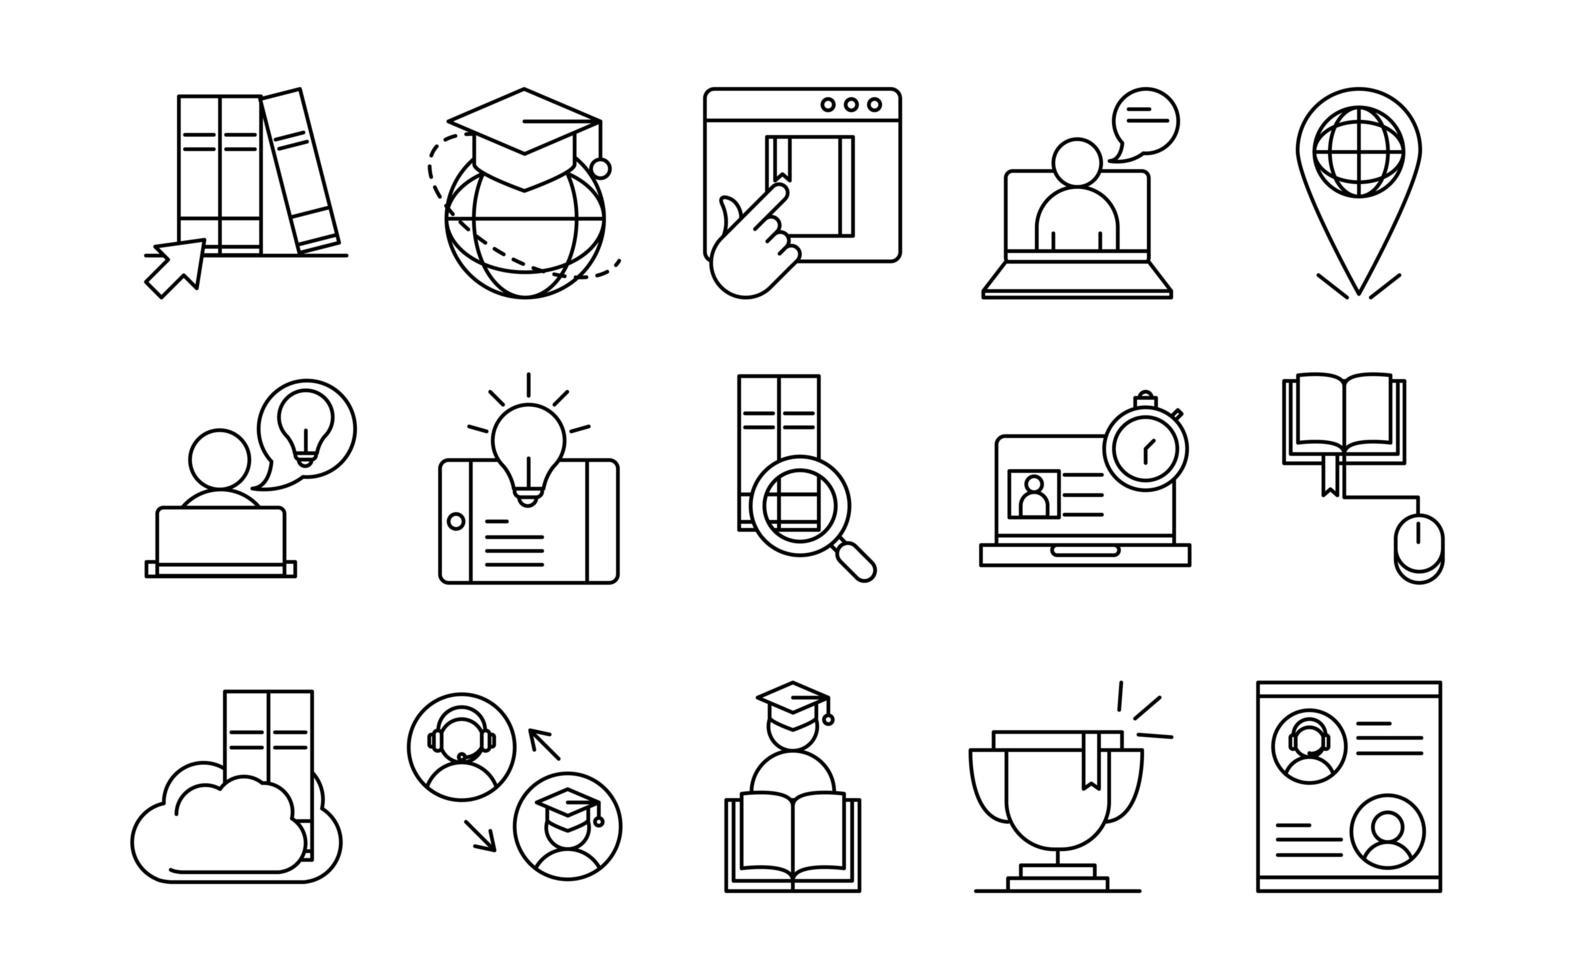 online utbildning linje piktogram ikon sortiment vektor